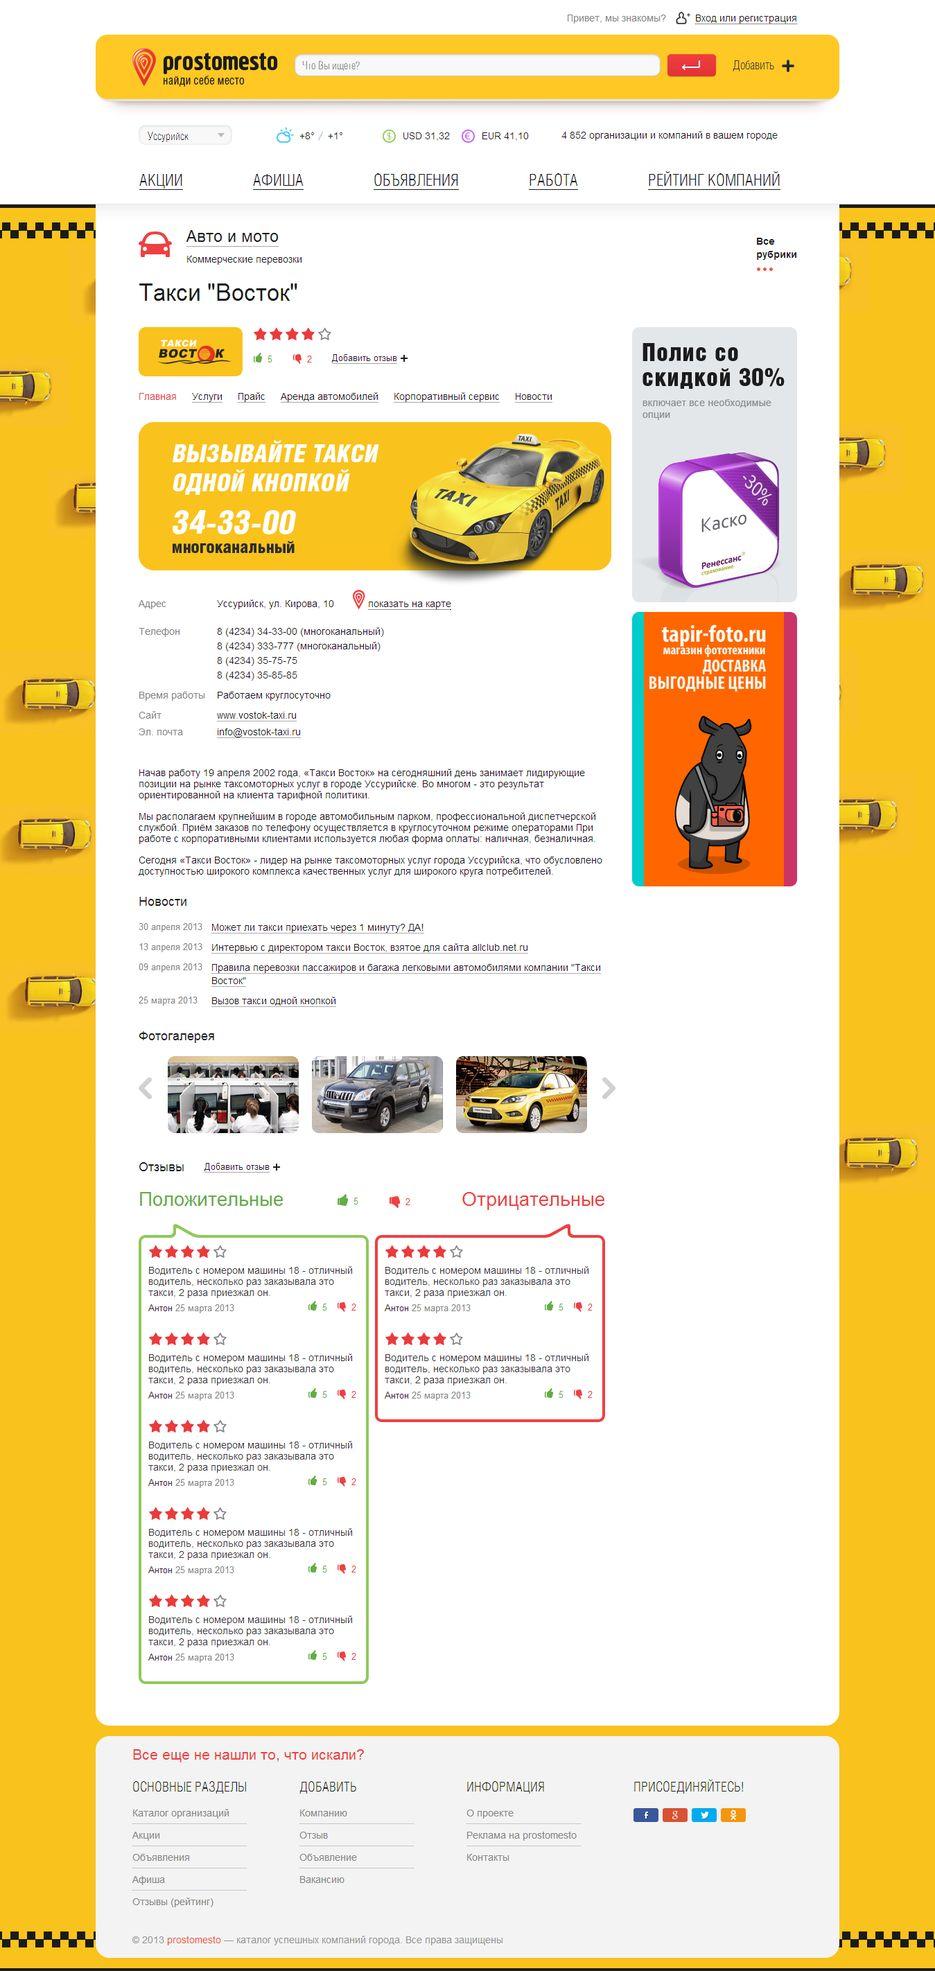 Описание такси